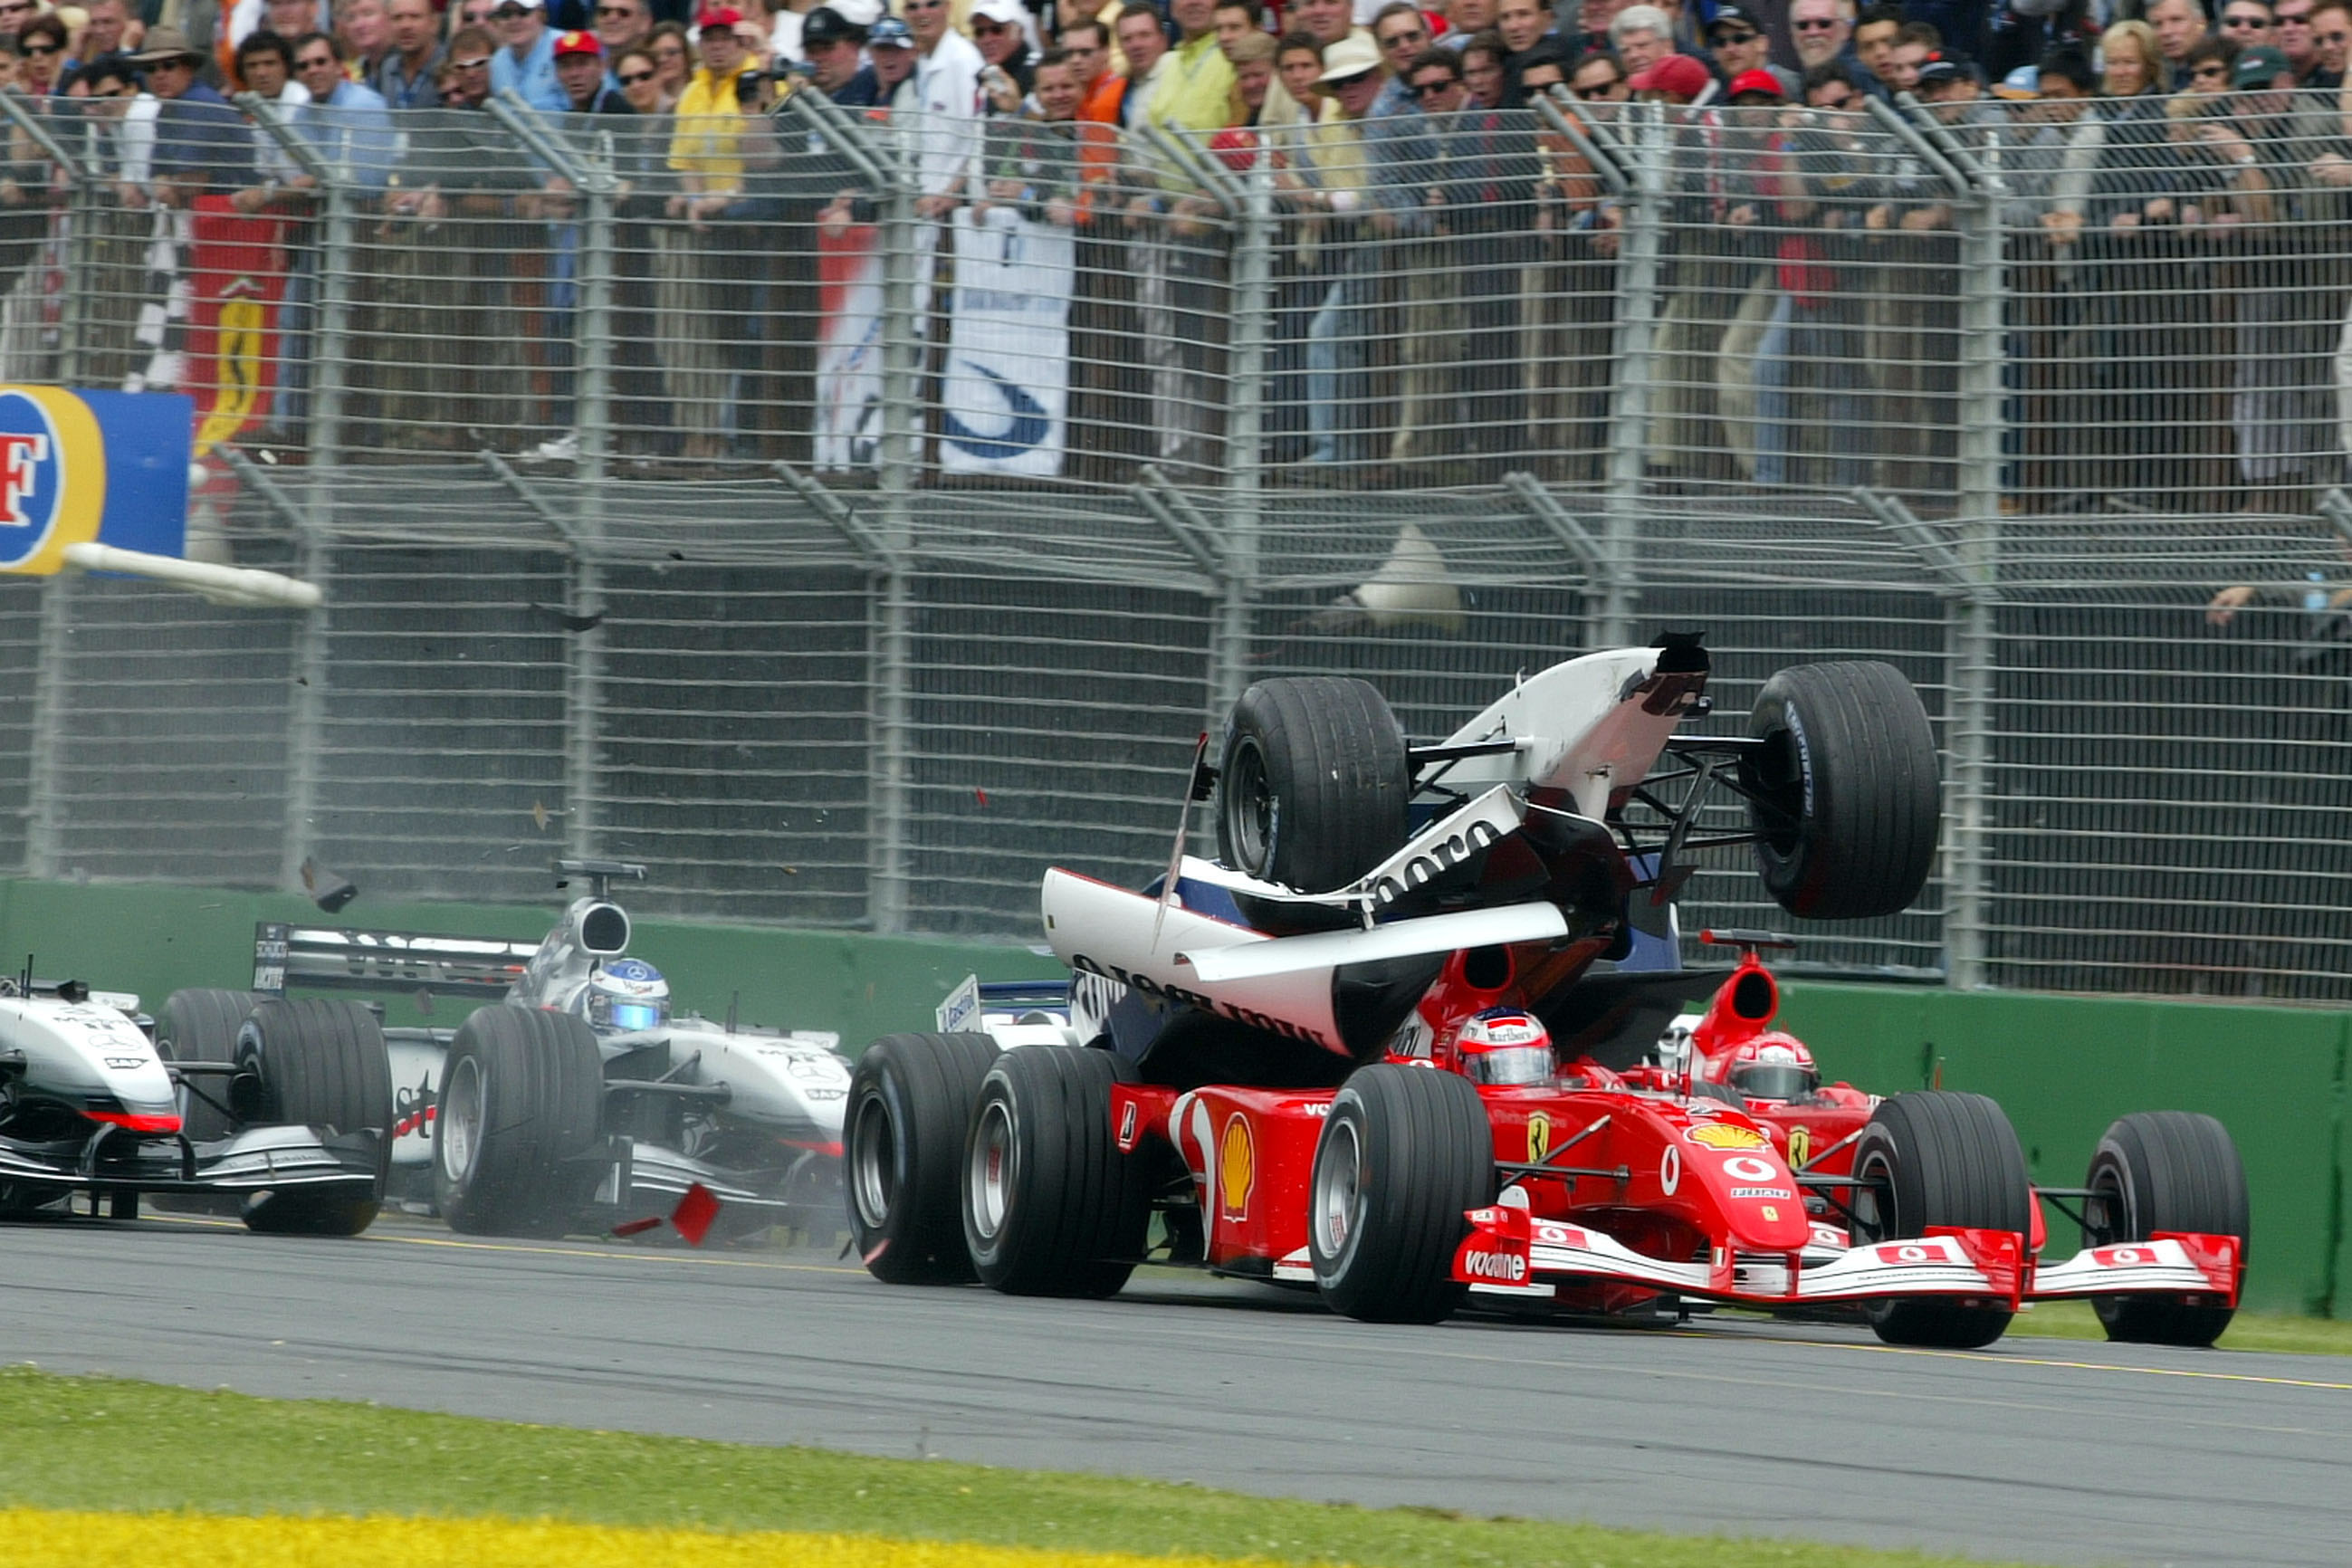 F1 2002, Australian Grand Prix, start